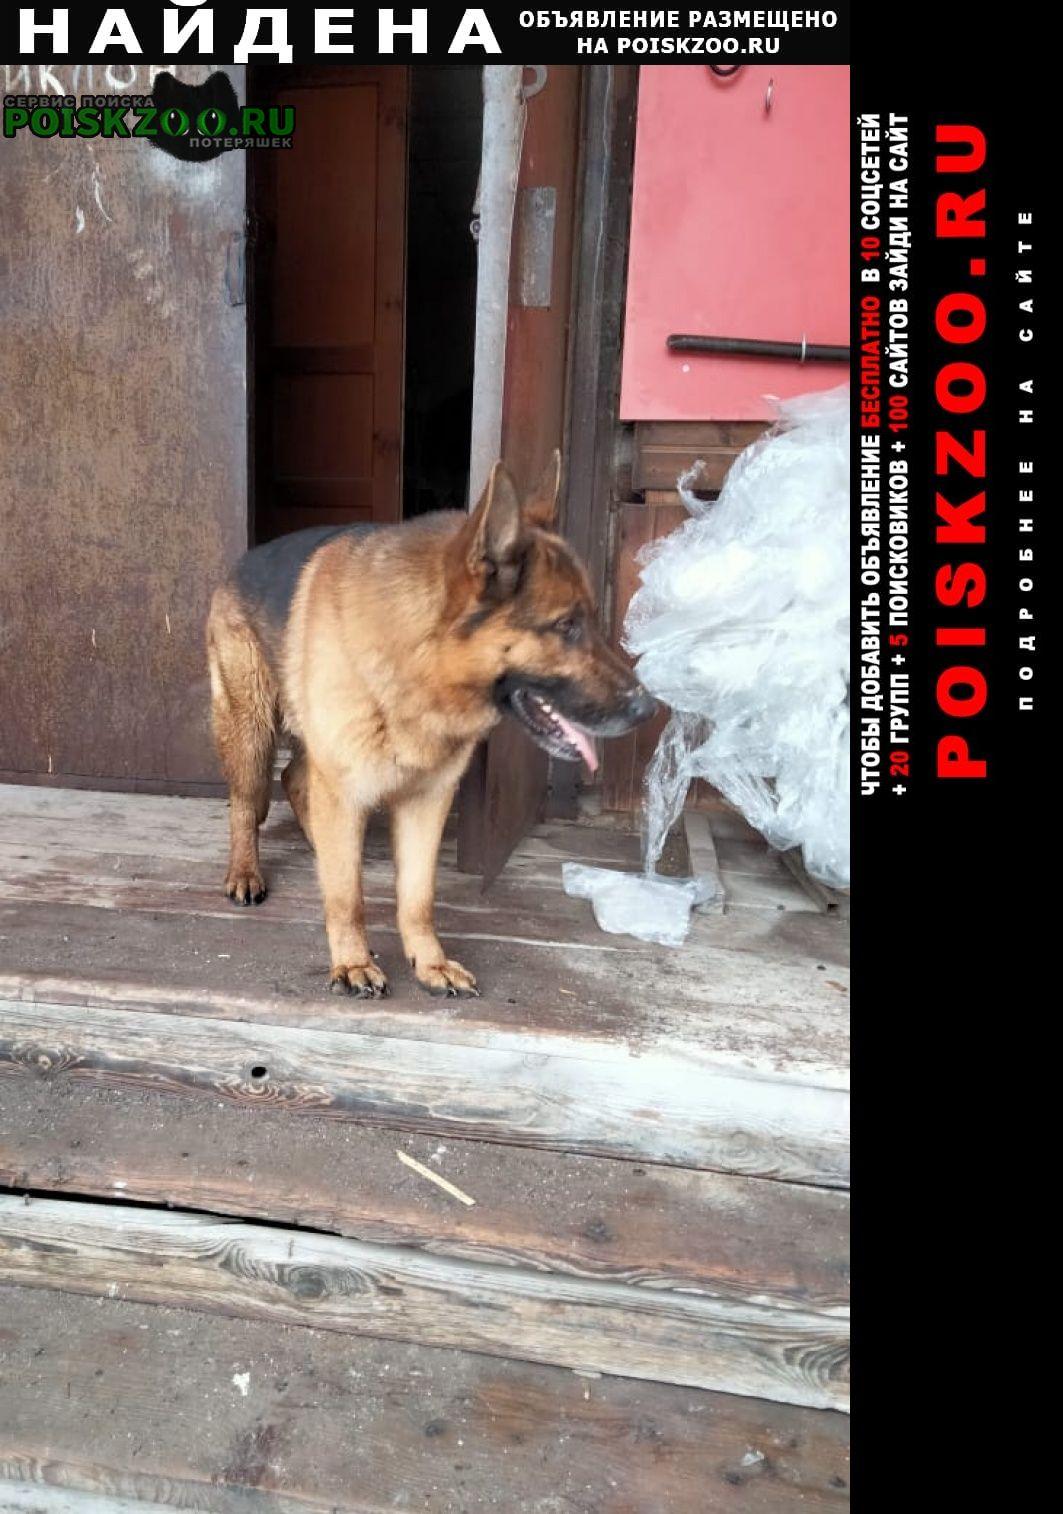 Найдена собака кобель, немецкая овчарка, без ошейника. Тула